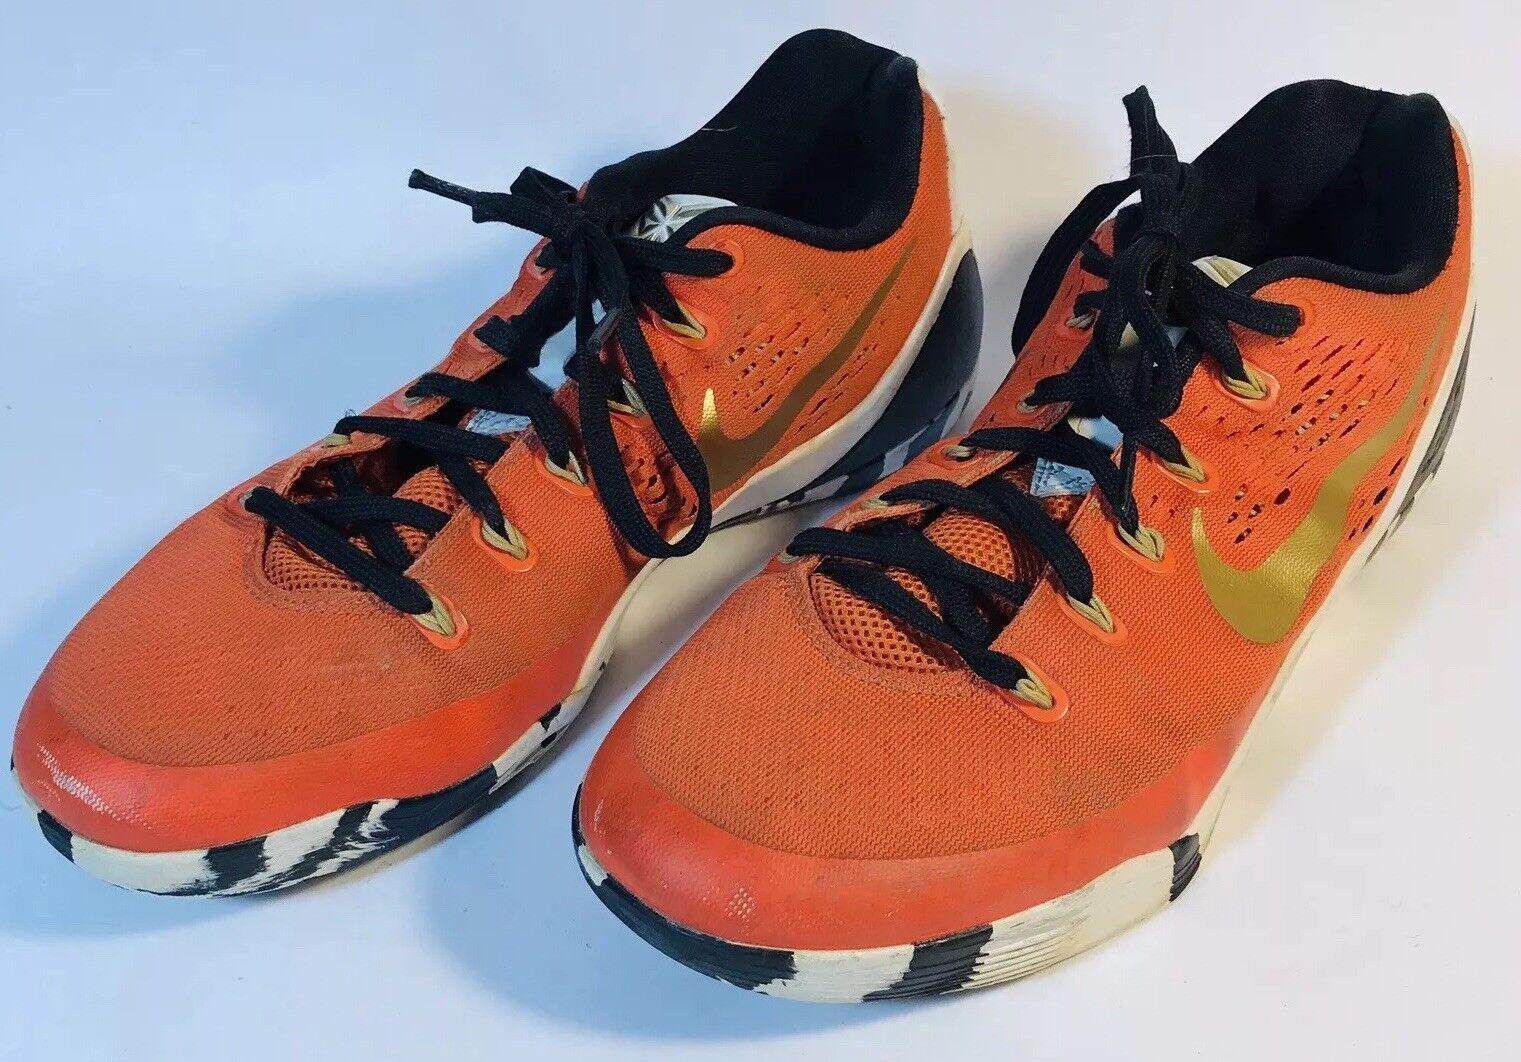 Nike iD Kobe 9 IX orange Black gold Striped Sole SZ9 Basketball shoes 688501-988